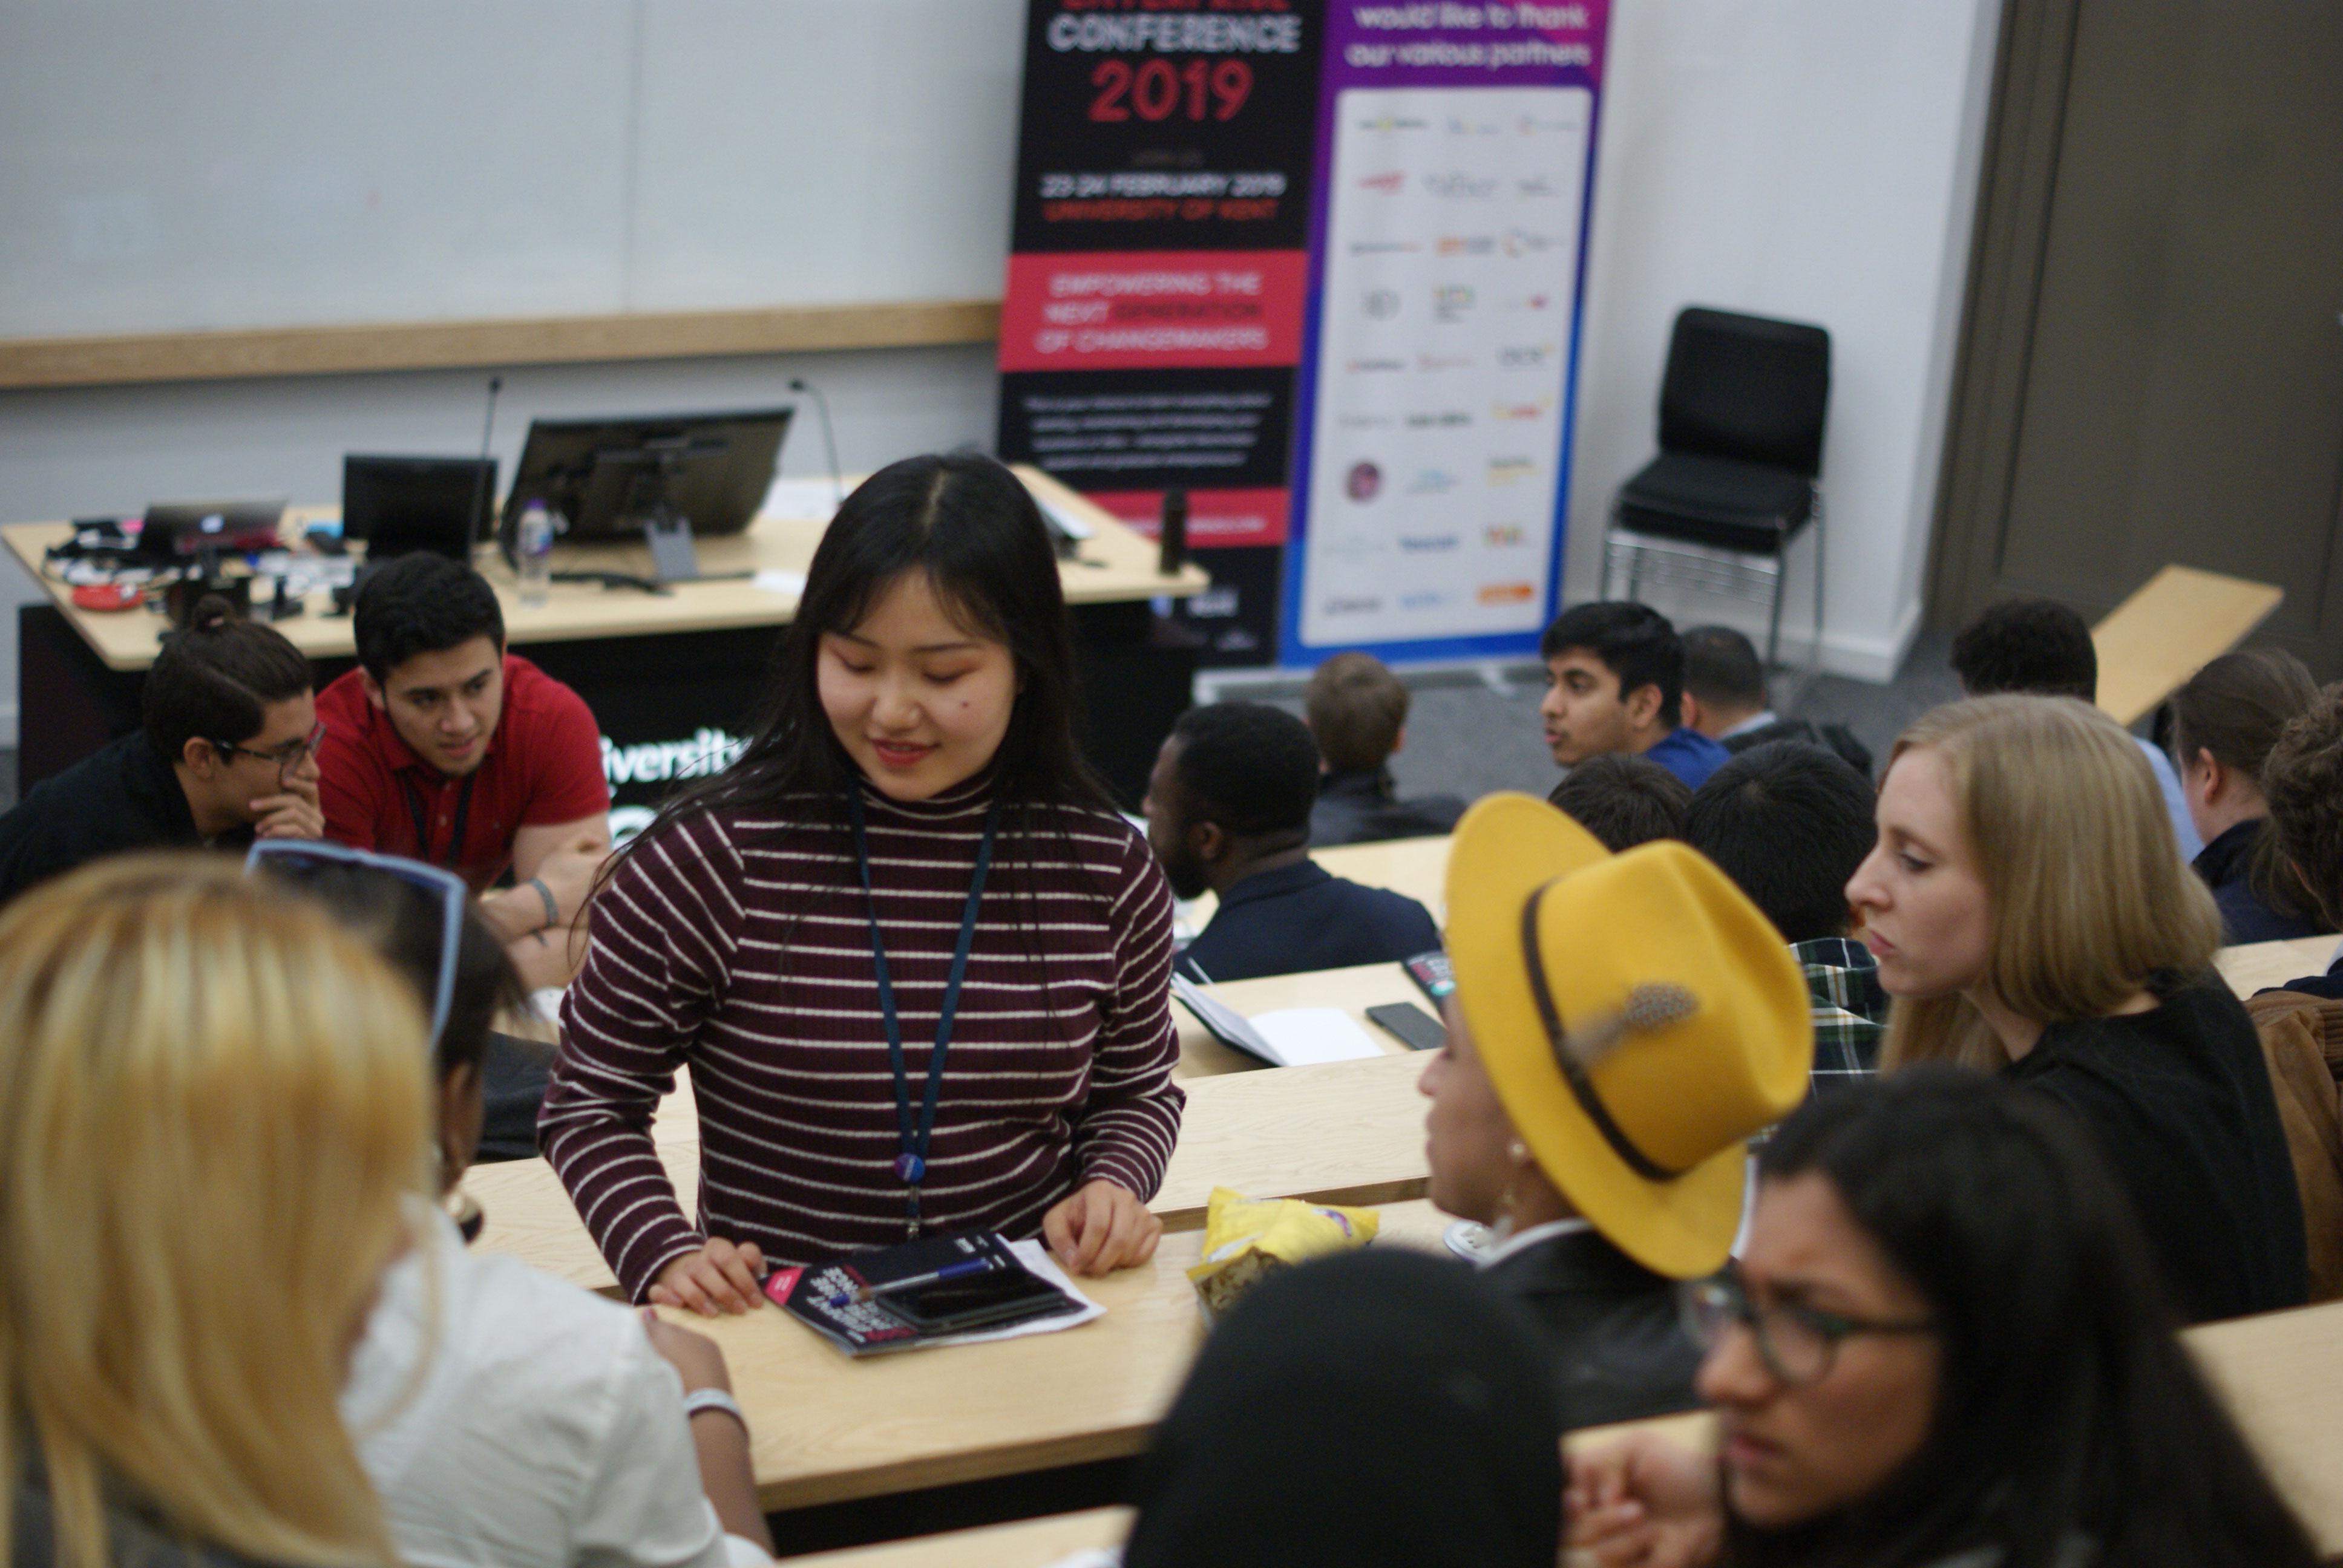 Student Enterprise Conference 2019